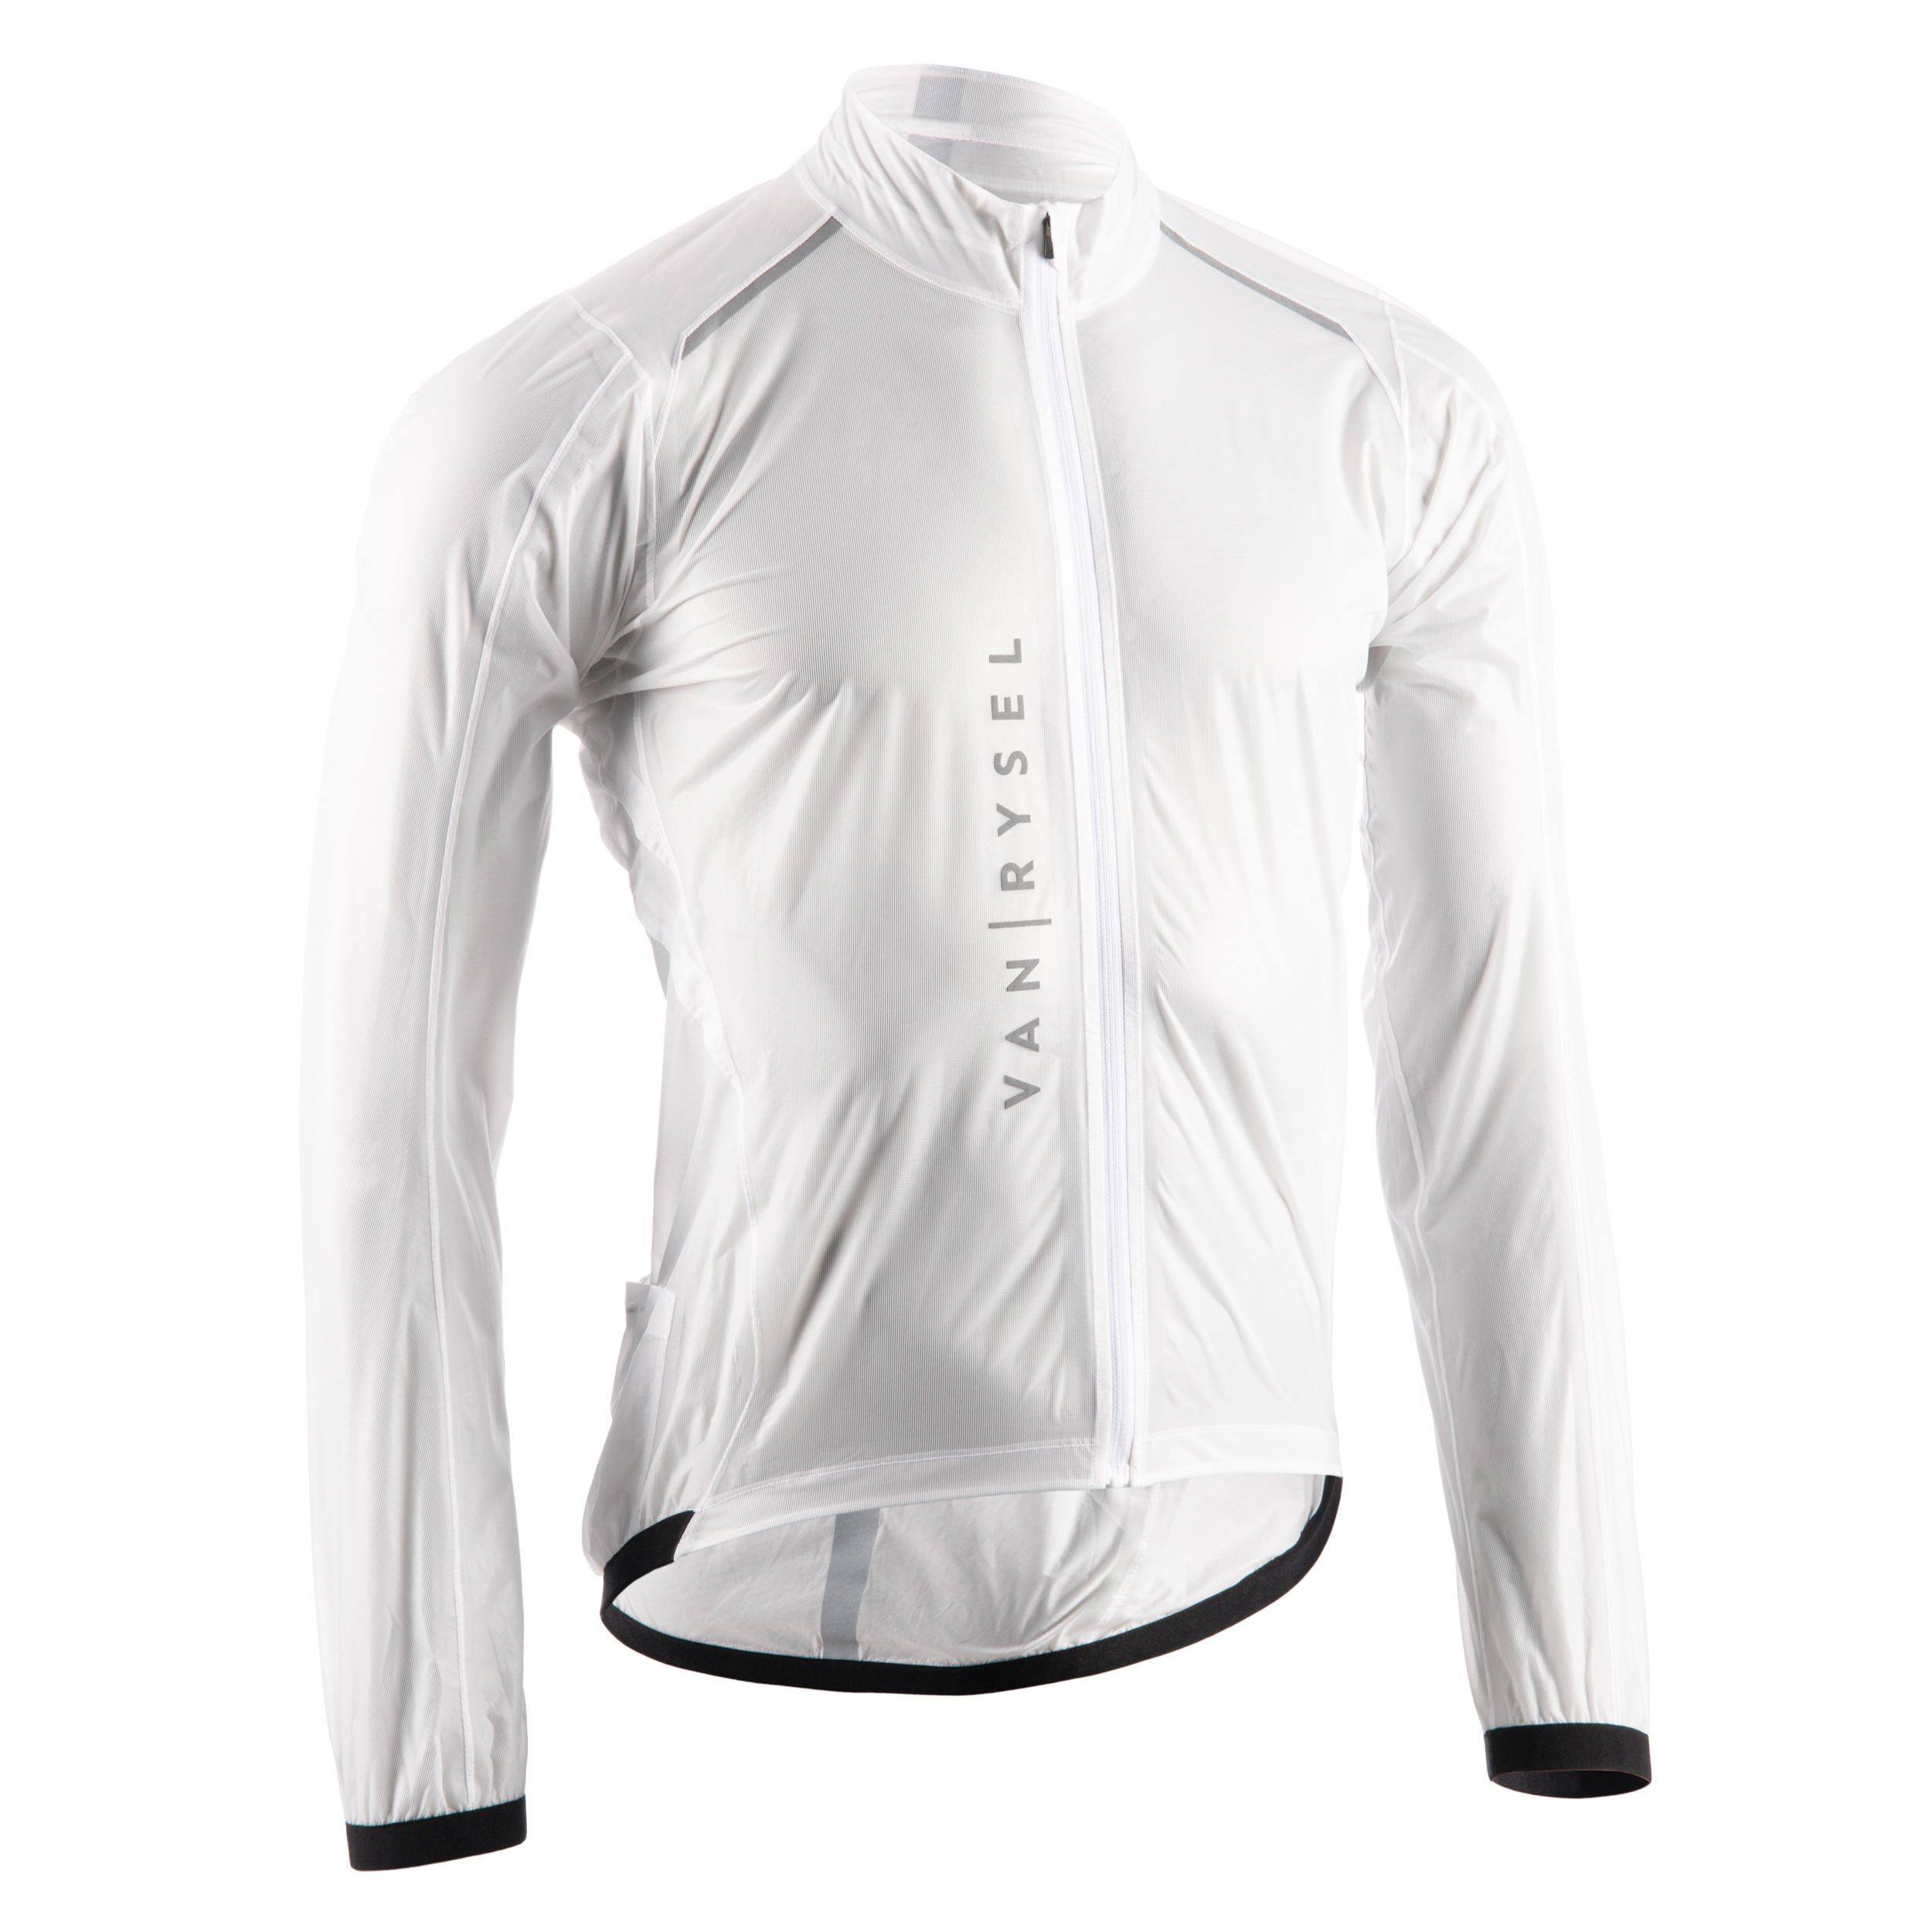 Jachetă ploaie Ultralight Alb imagine